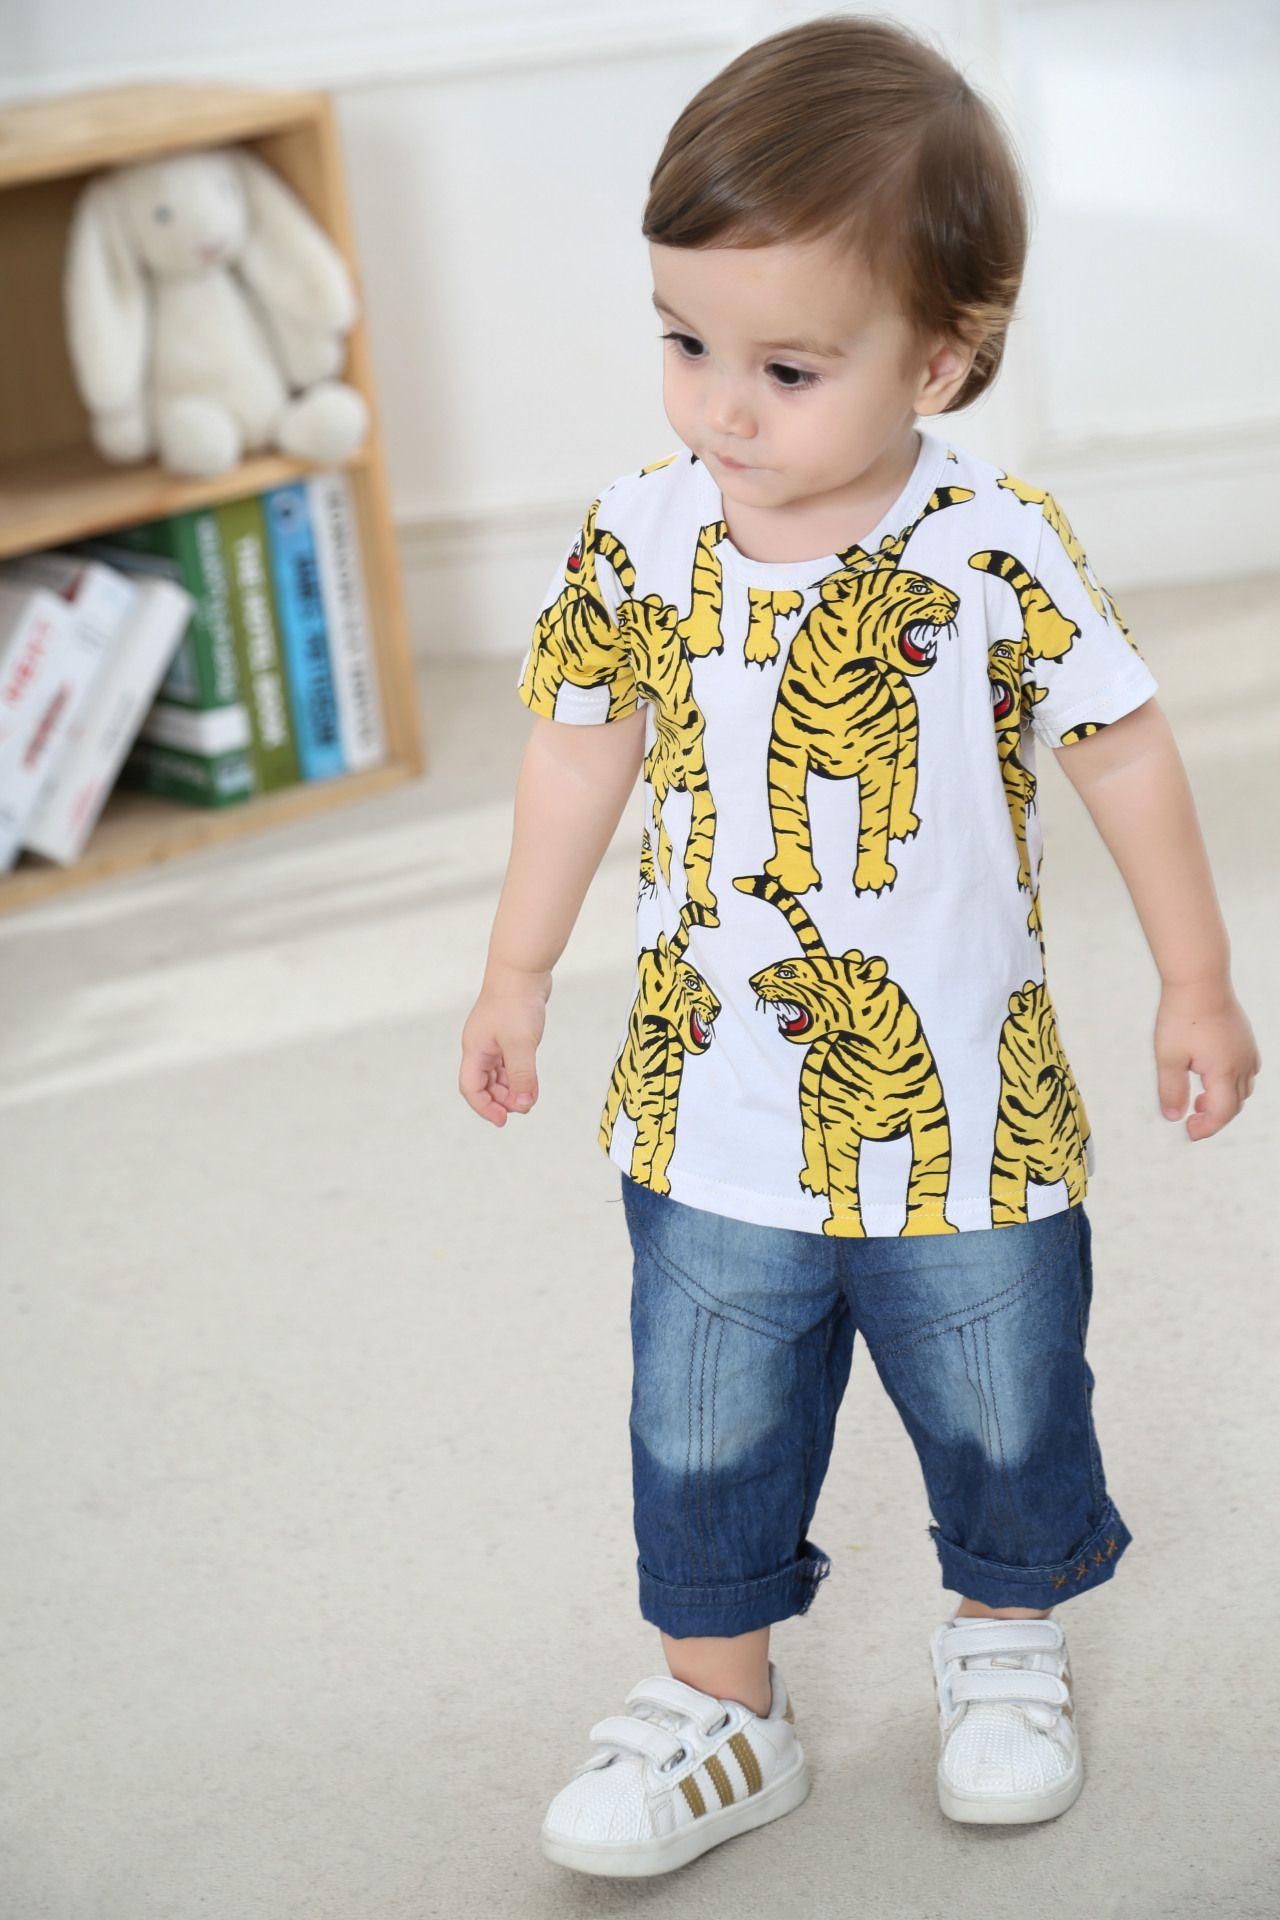 Boys Girls Kids Cotton Short Shirts Tees Children Baby Tiger Design T-shirts Tops Tees Short Sleeve Clothes Baby Shirts Clothes Babies Shirt